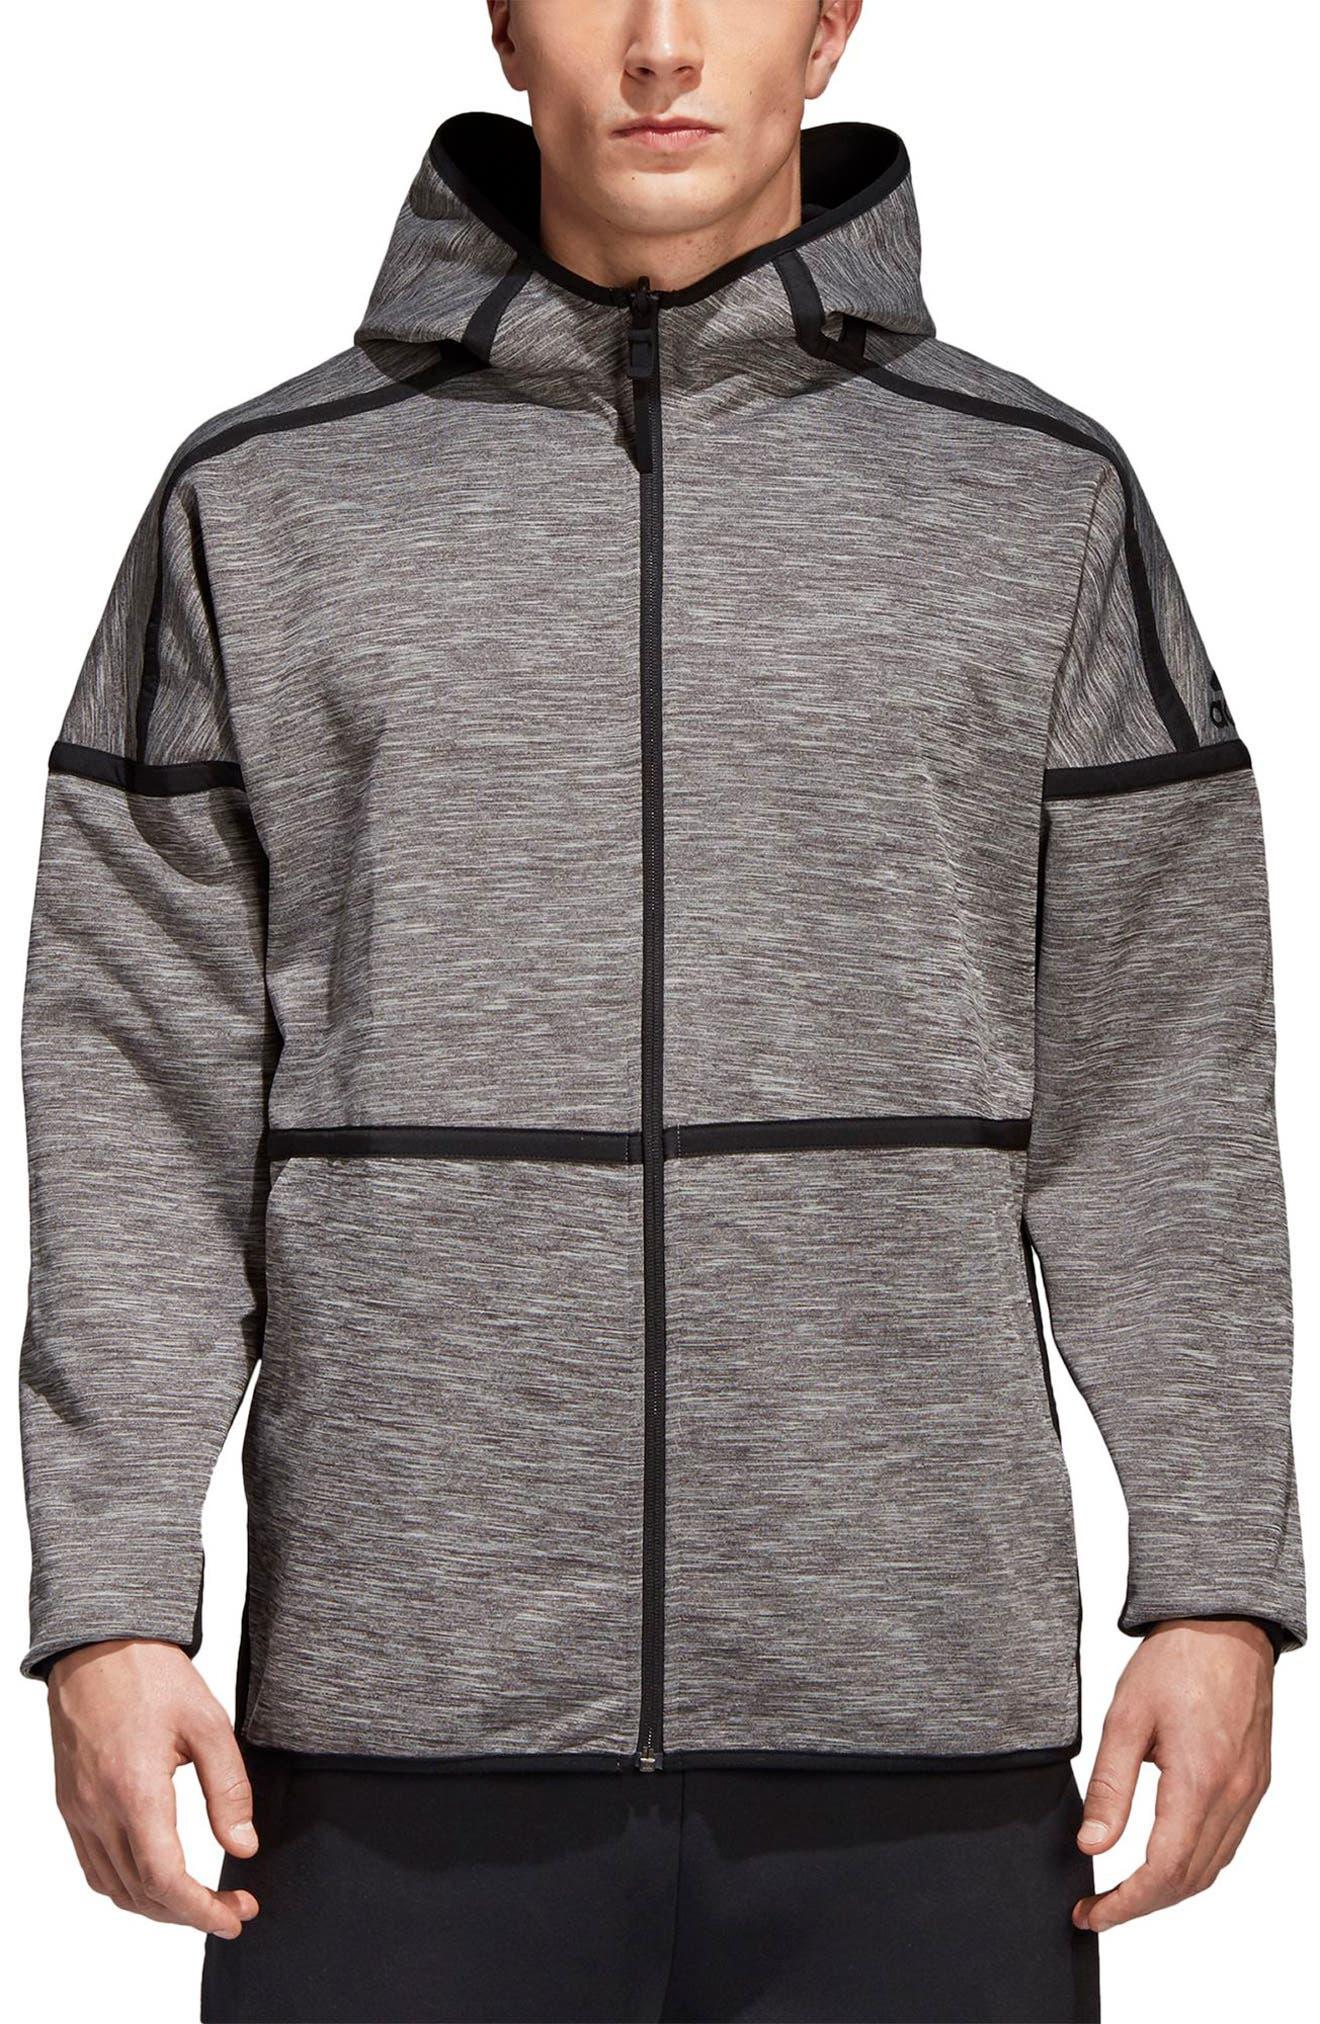 ZNE Regular Fit Reversible Hooded Jacket,                         Main,                         color, Black / Storm Heather/ Mgh